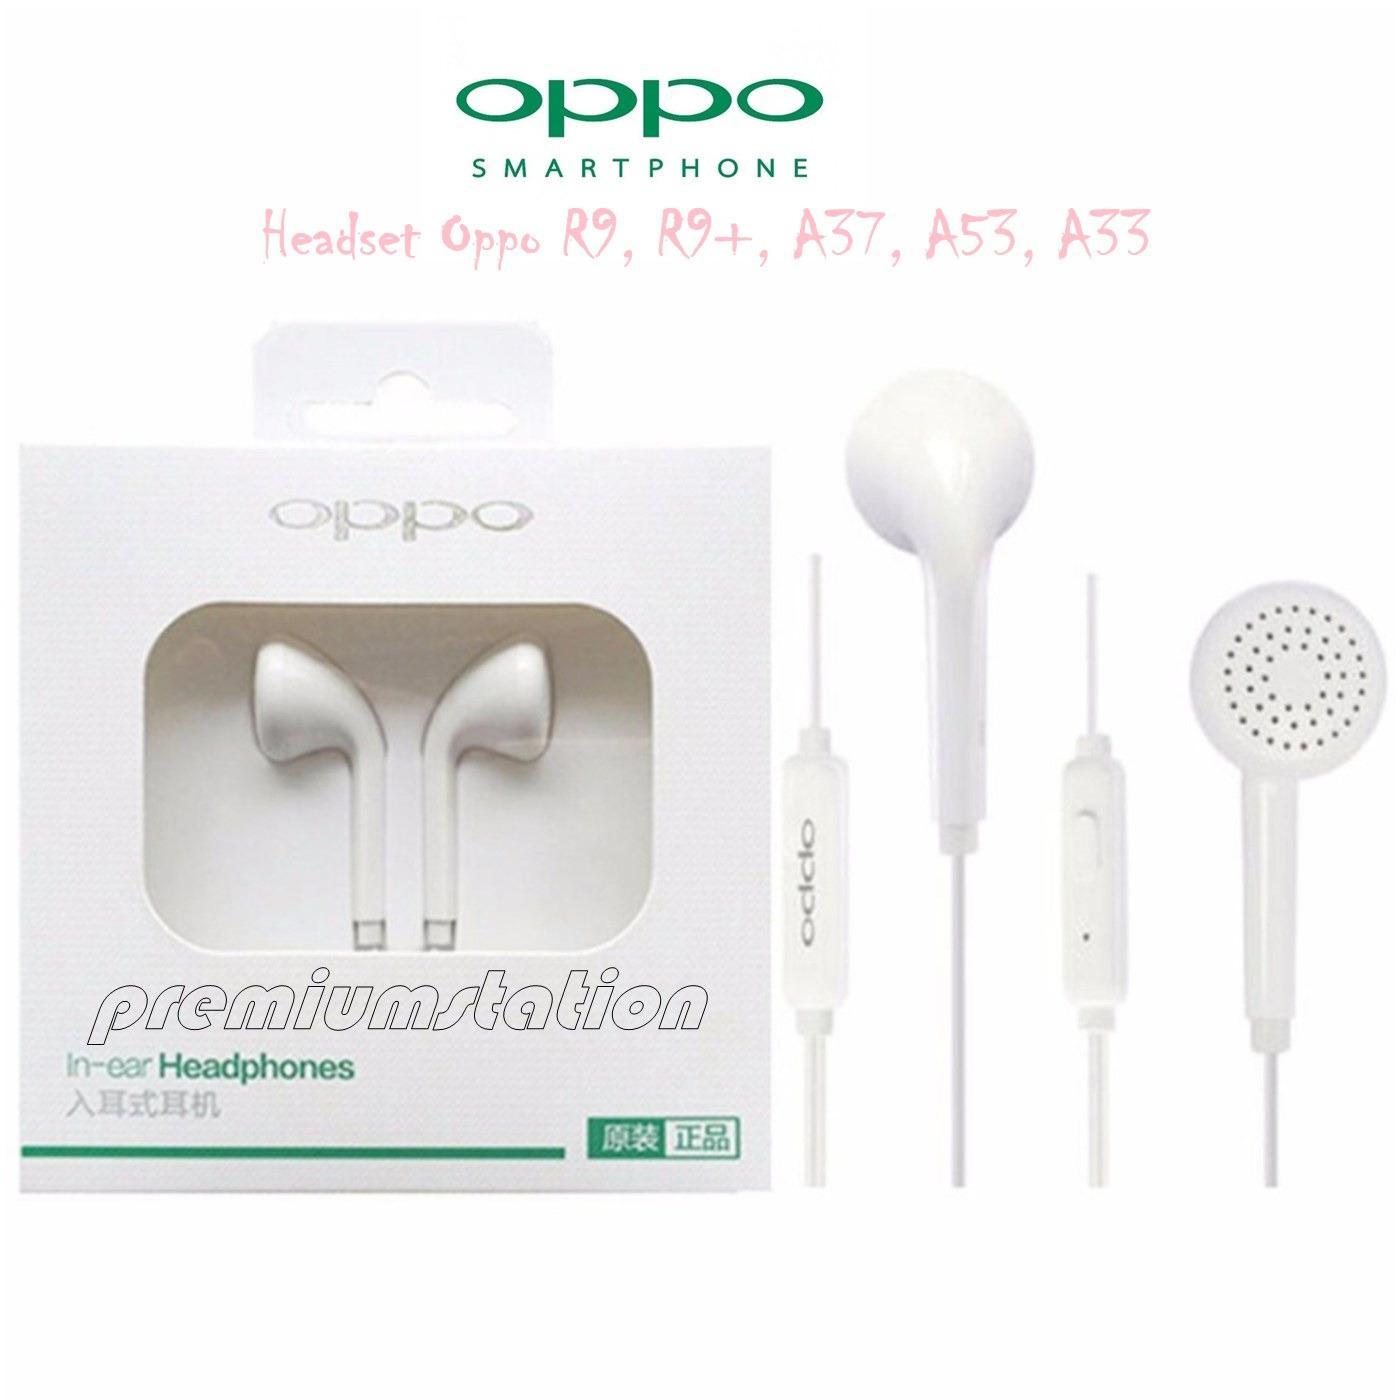 eShop Checker Xiaomi Earphone Big Bass Piston Mi 2nd Generation Source · Terjamin Keamananya Oppo Headset Phones Hansfree Music Ear Oppo R9 R9 A37 A53